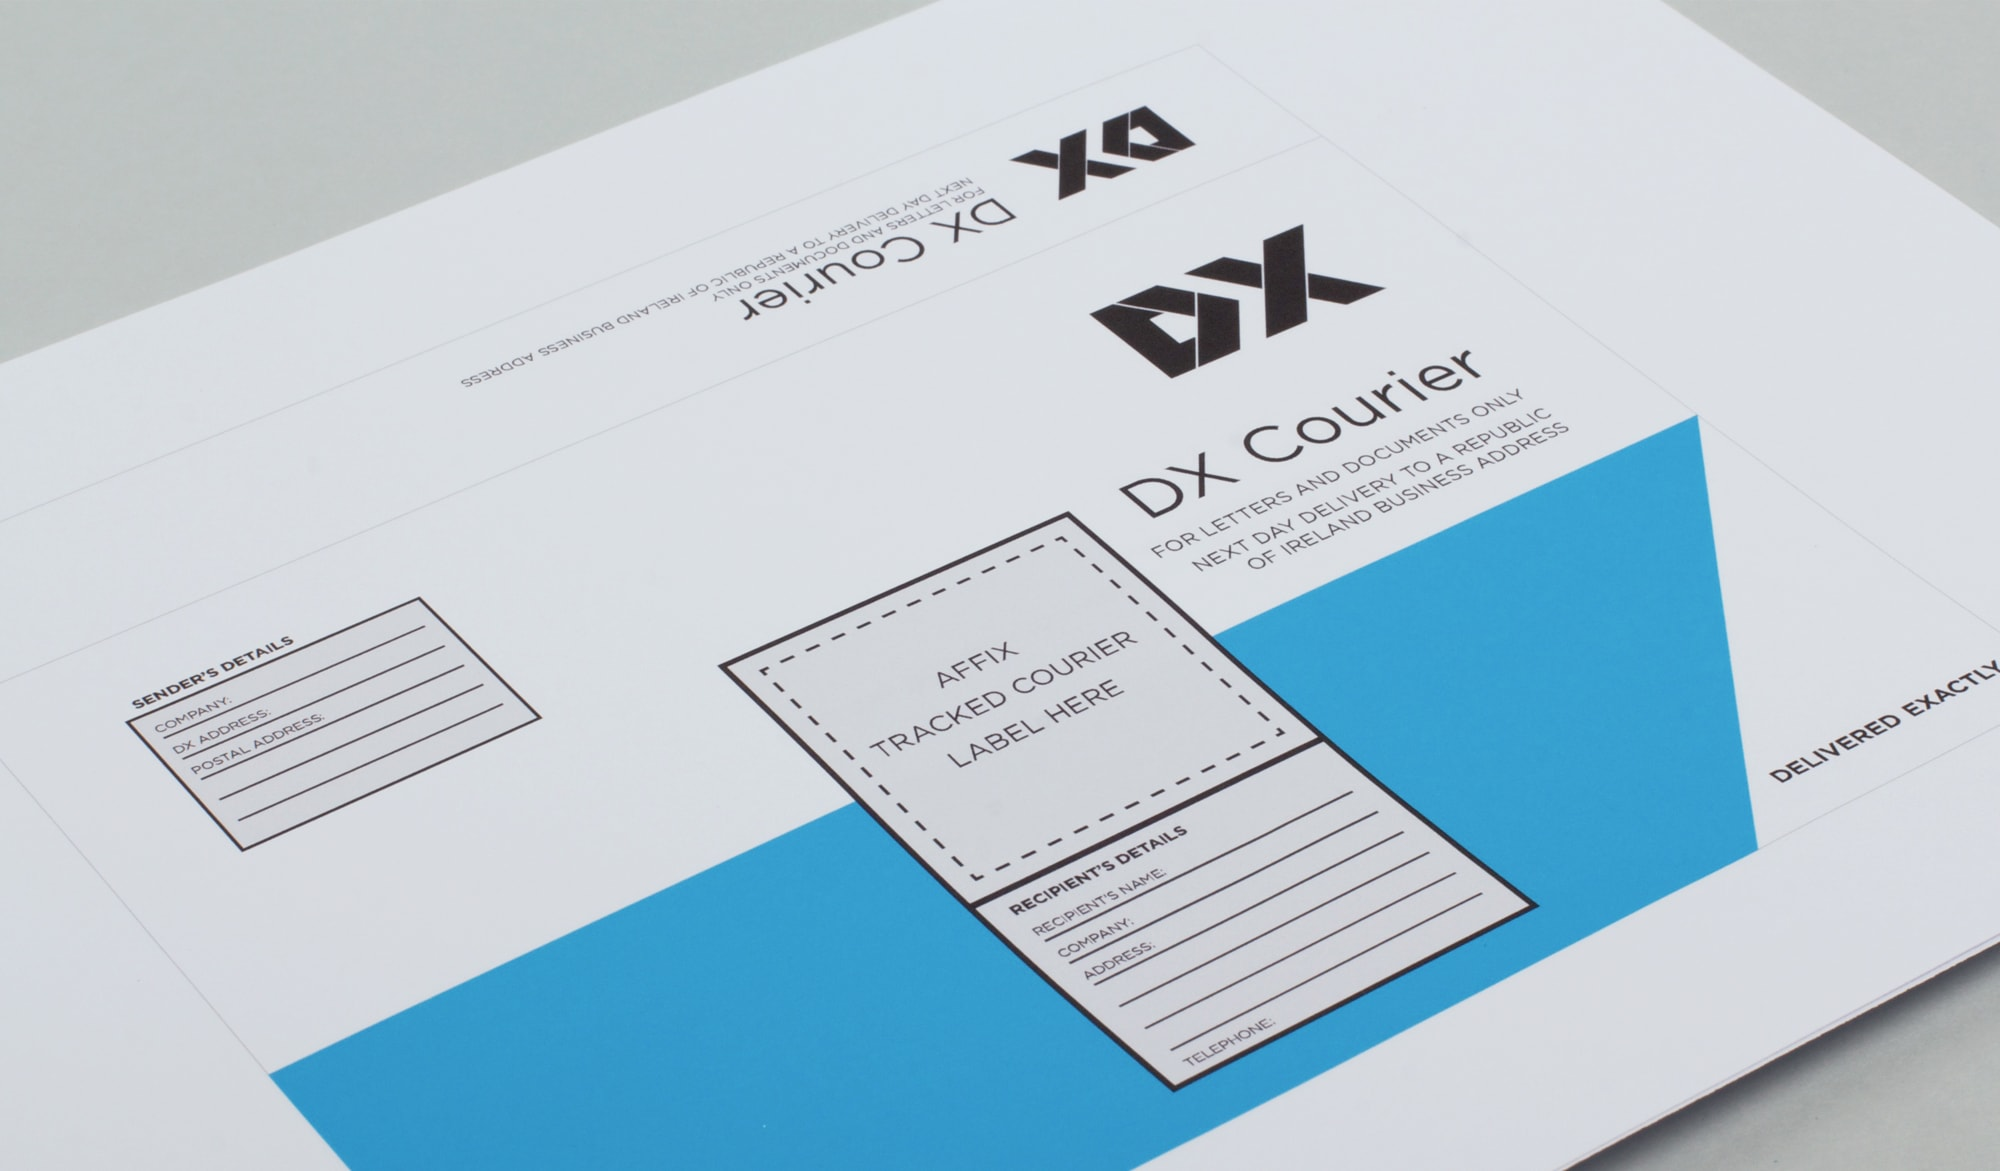 DX packaging